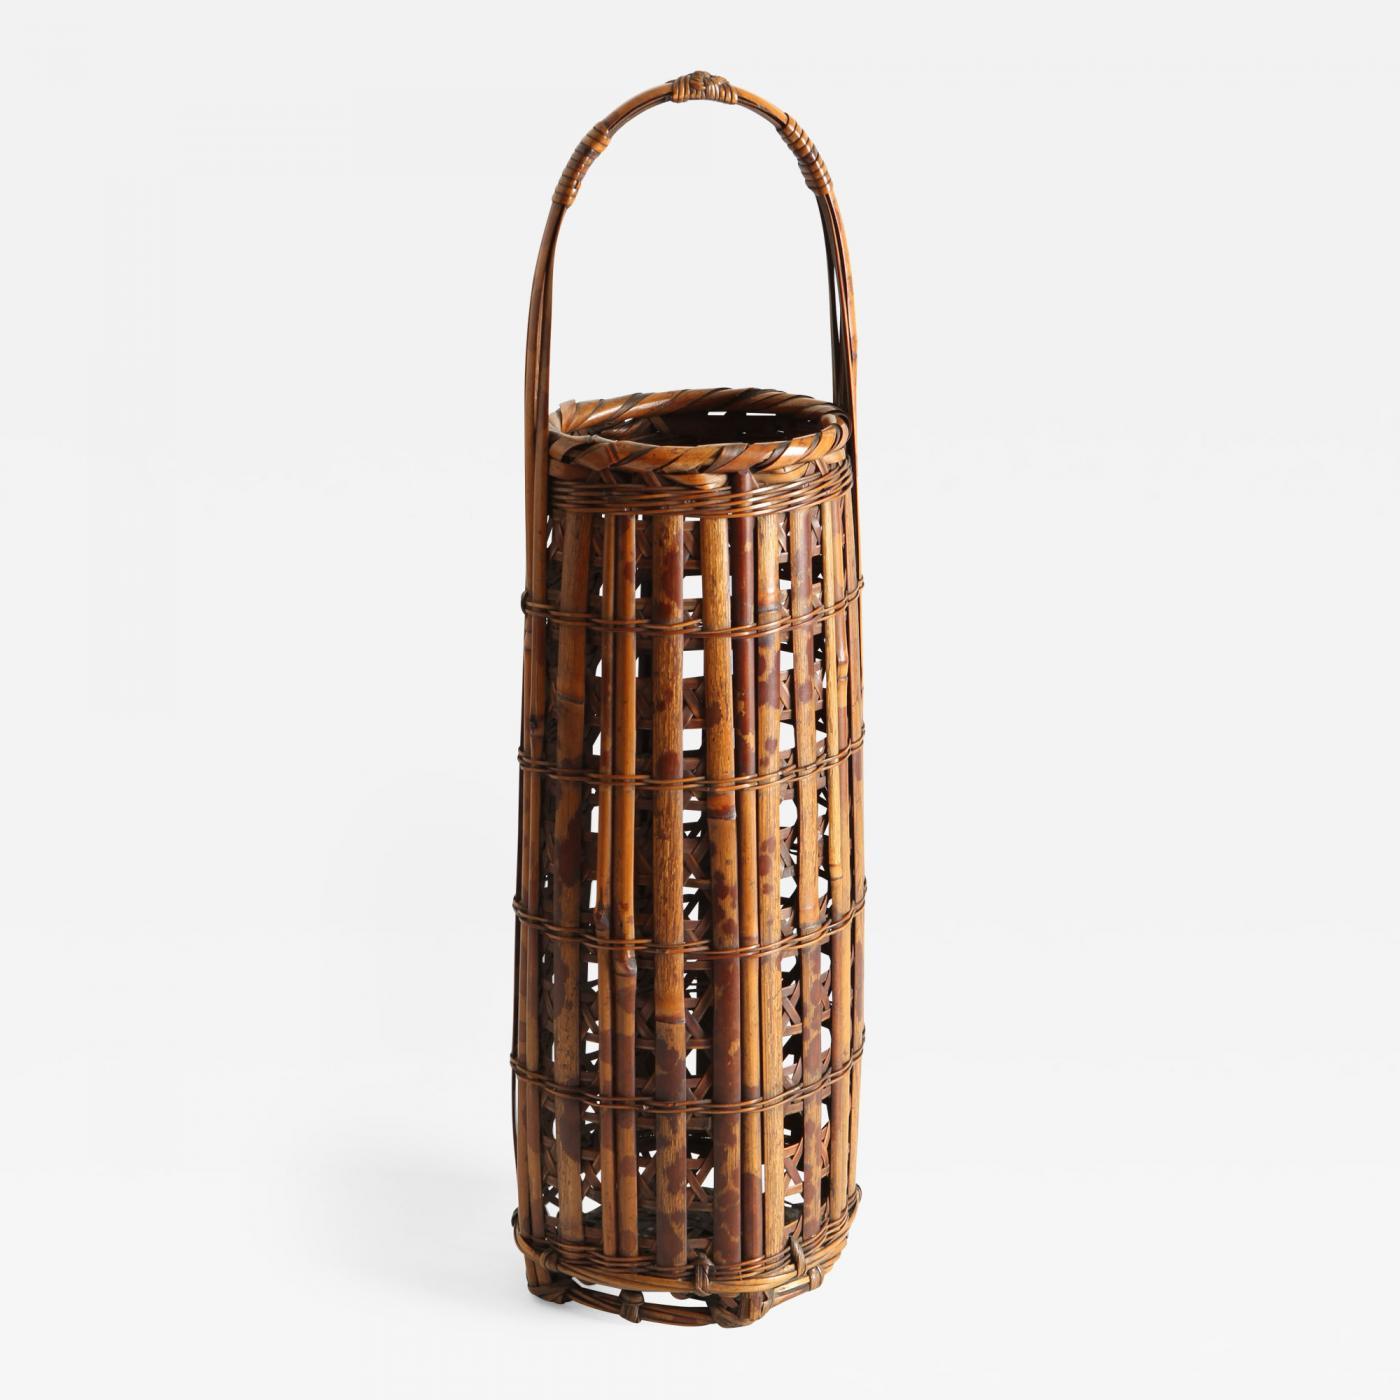 Bamboo Basket Making Supplies : Tanabe chikuunsai i bamboo ikebana basket